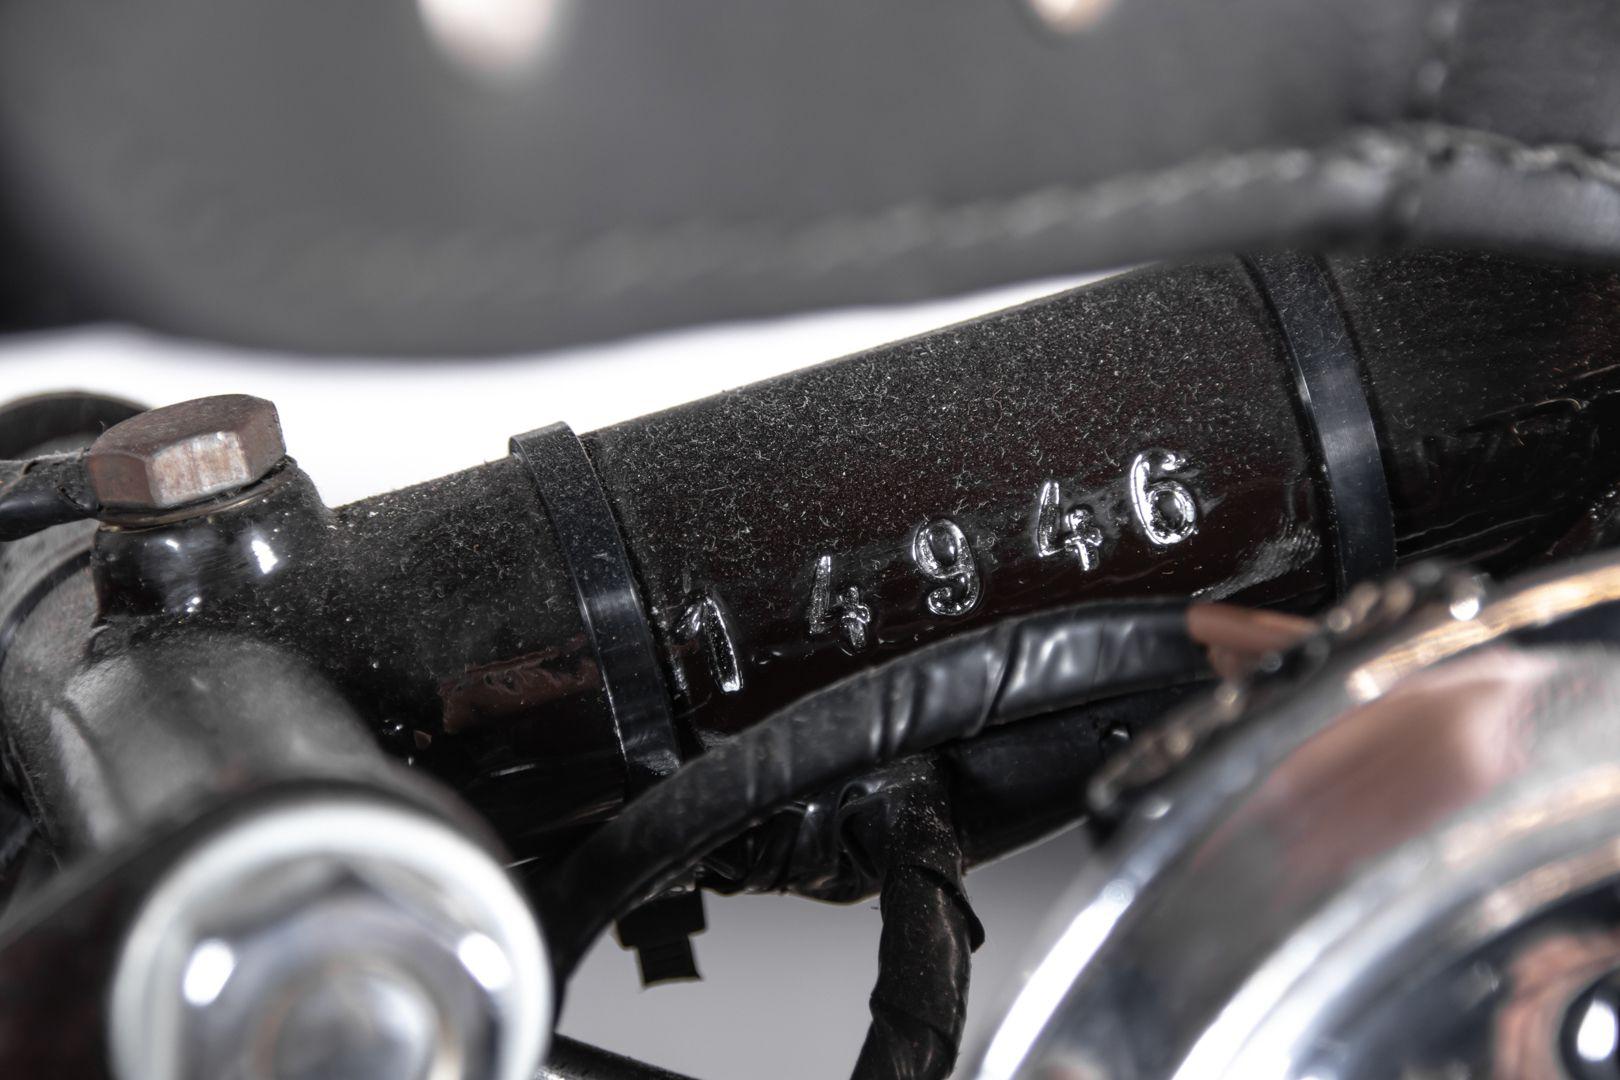 1951 Moto Guzzi 500 72201